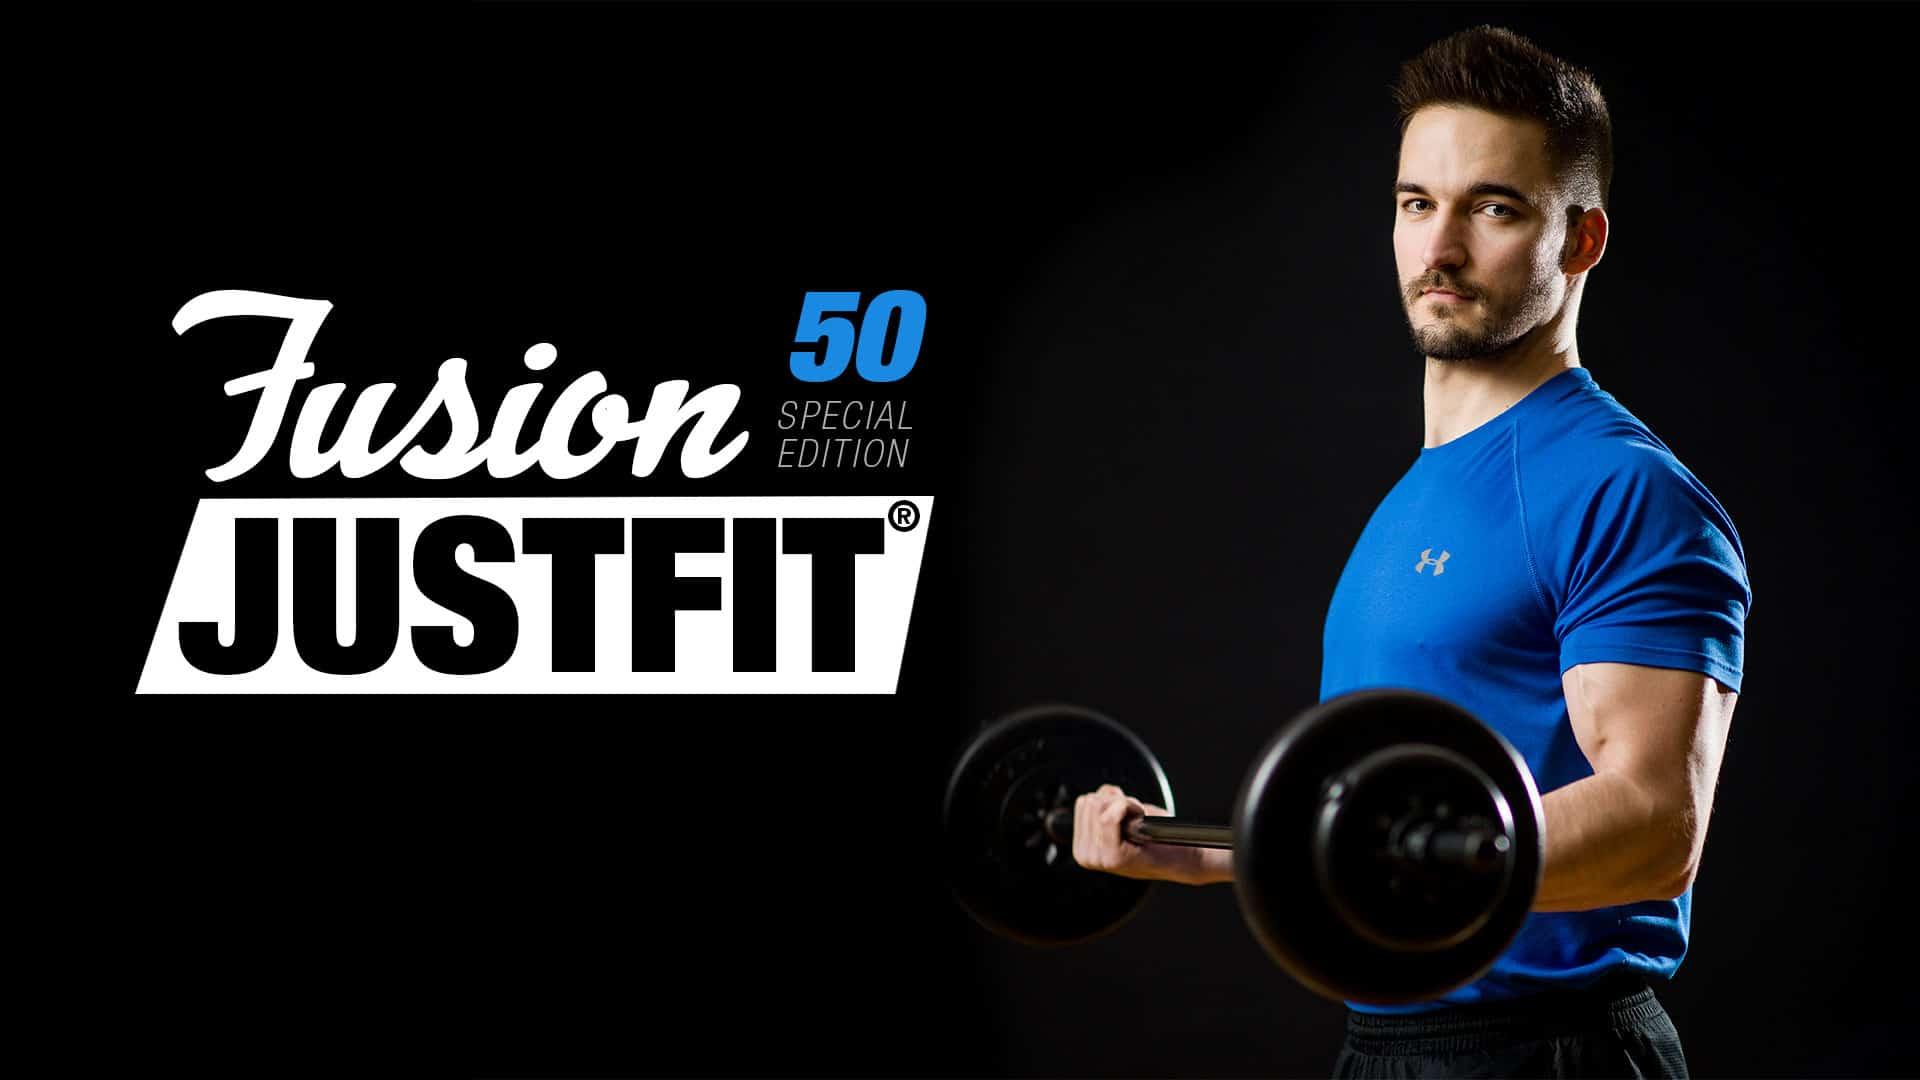 Fusion Justfit 50